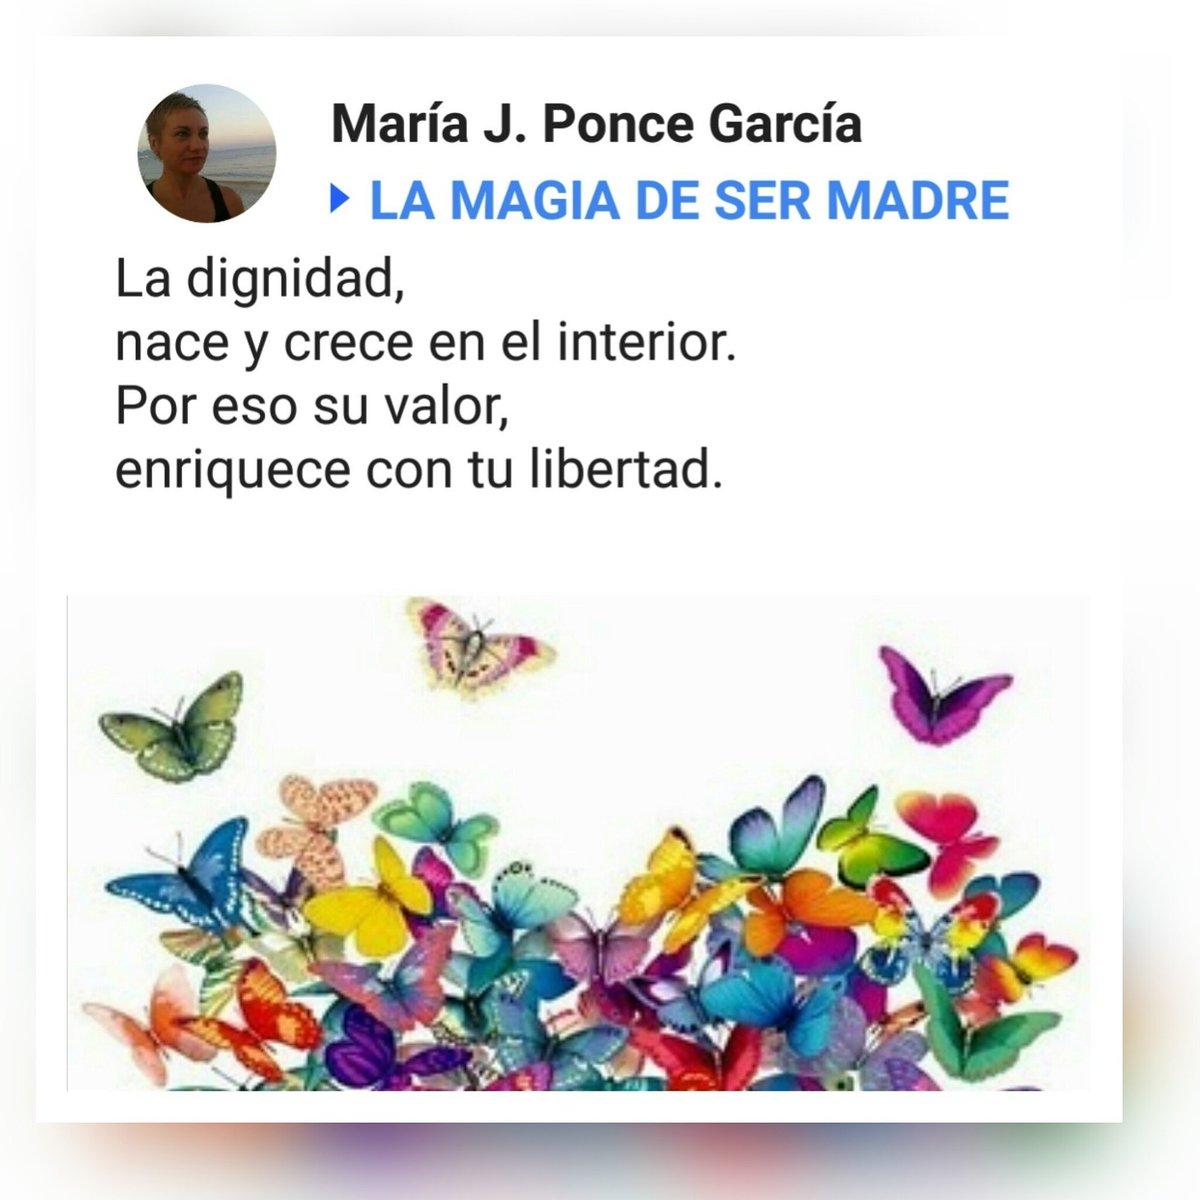 RT @mjpg69: #Dignidad https://t.co/ifdOGH9pse